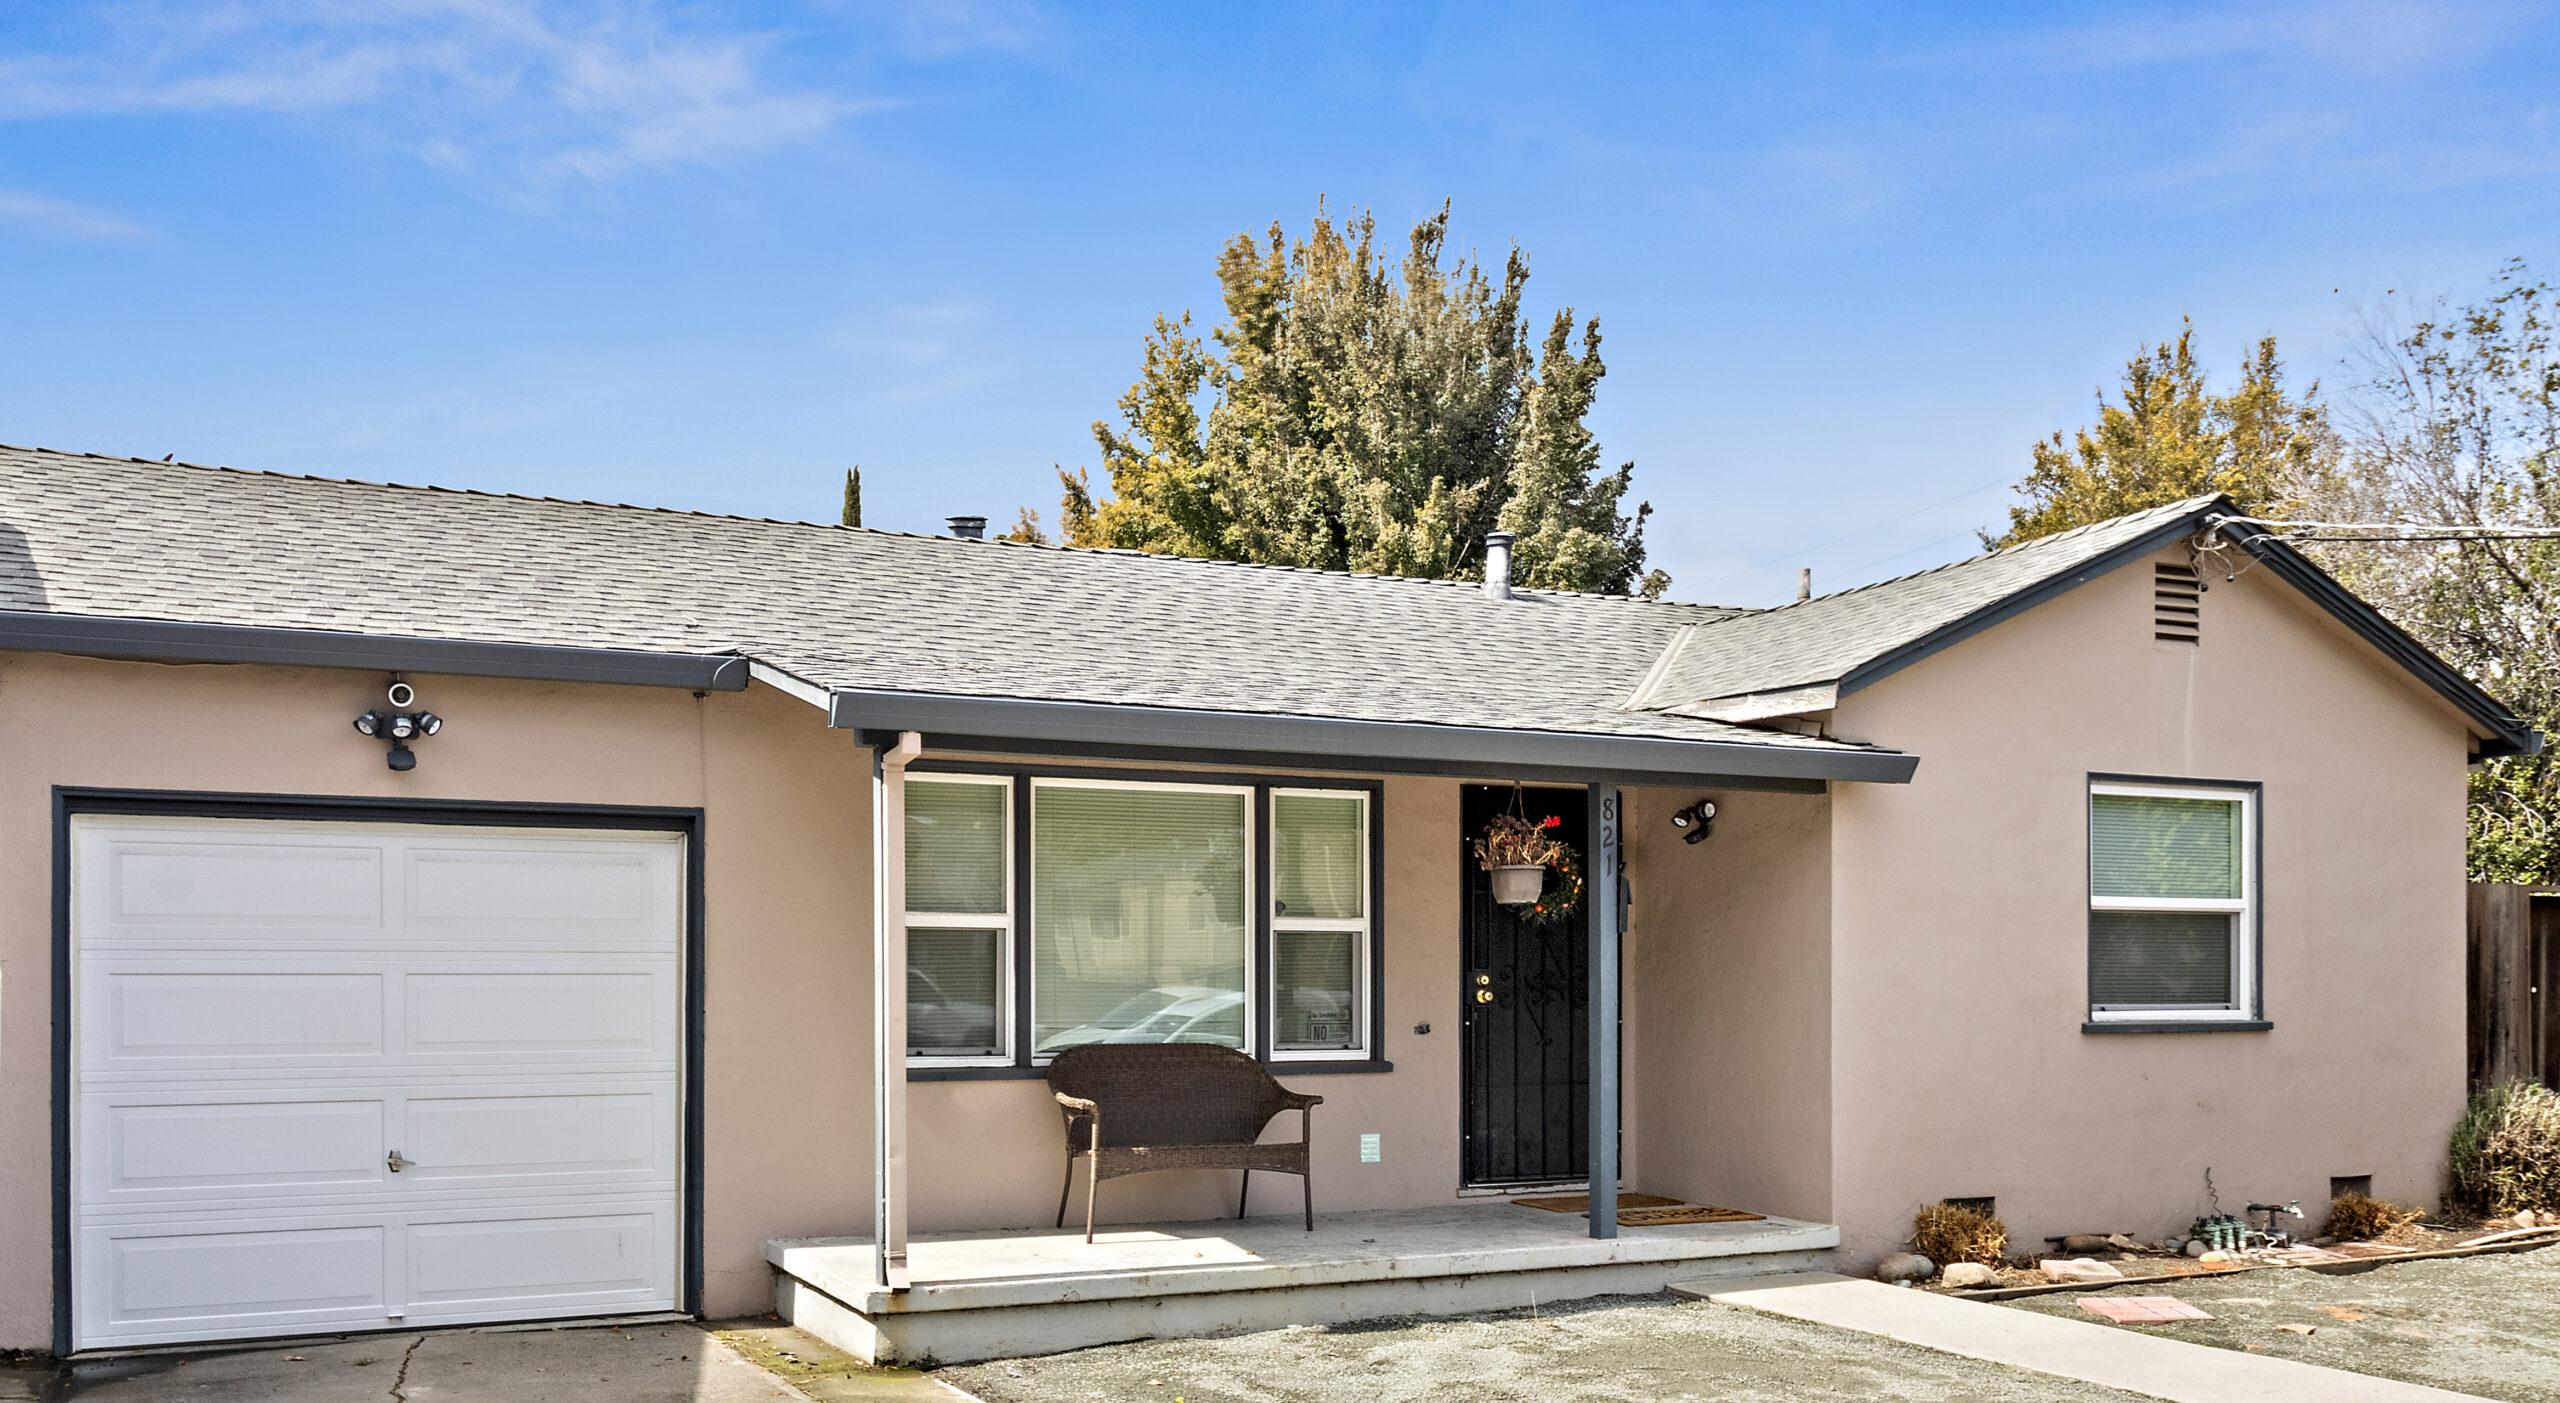 821-837 Northrup Street front yard